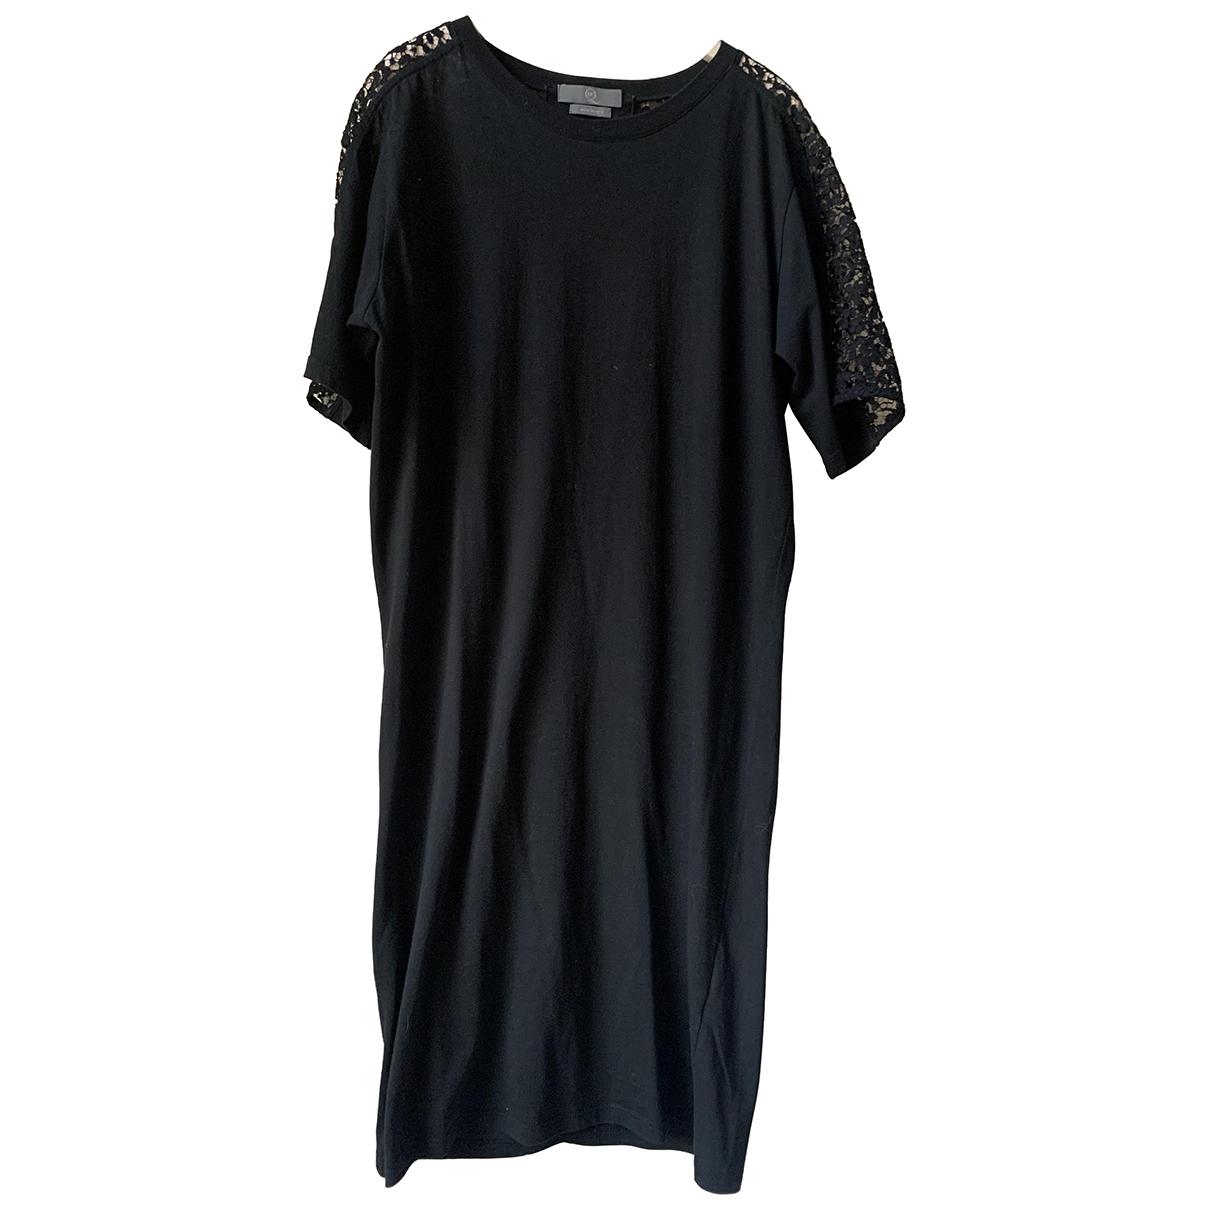 Mcq N Black Cotton - elasthane dress for Women S International